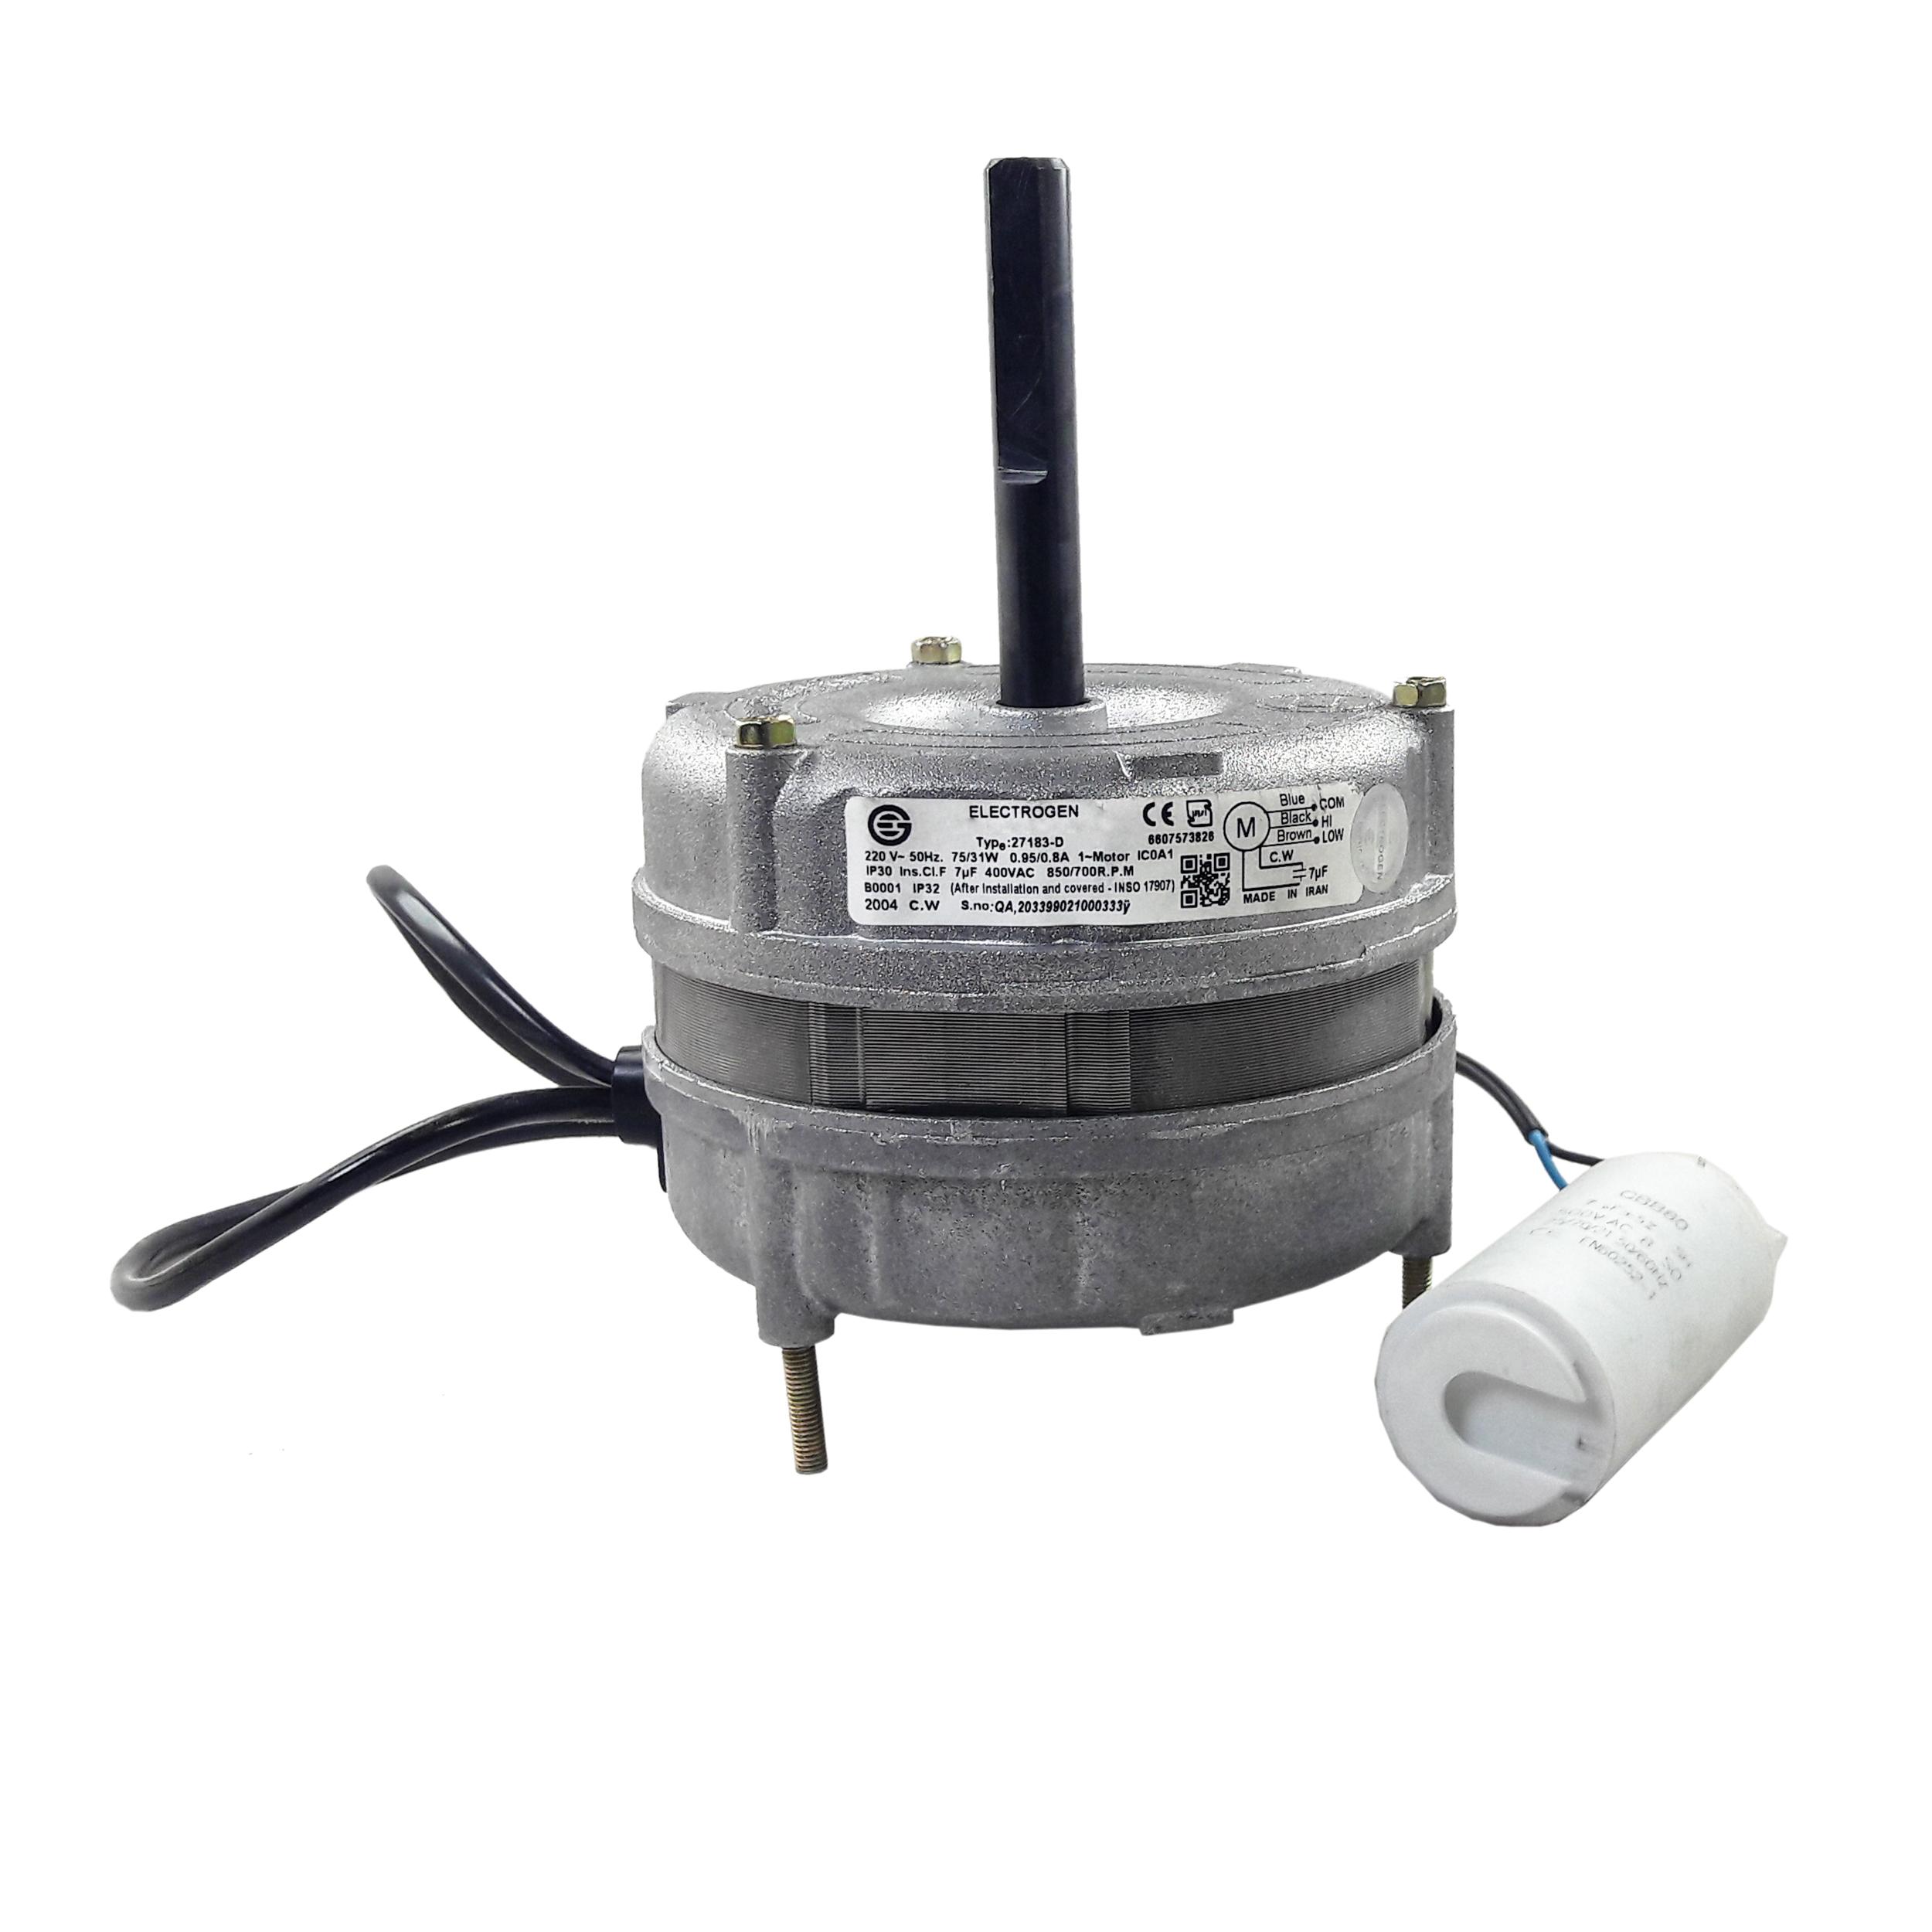 الکترو موتور کولر آبی الکتروژن مدل E D